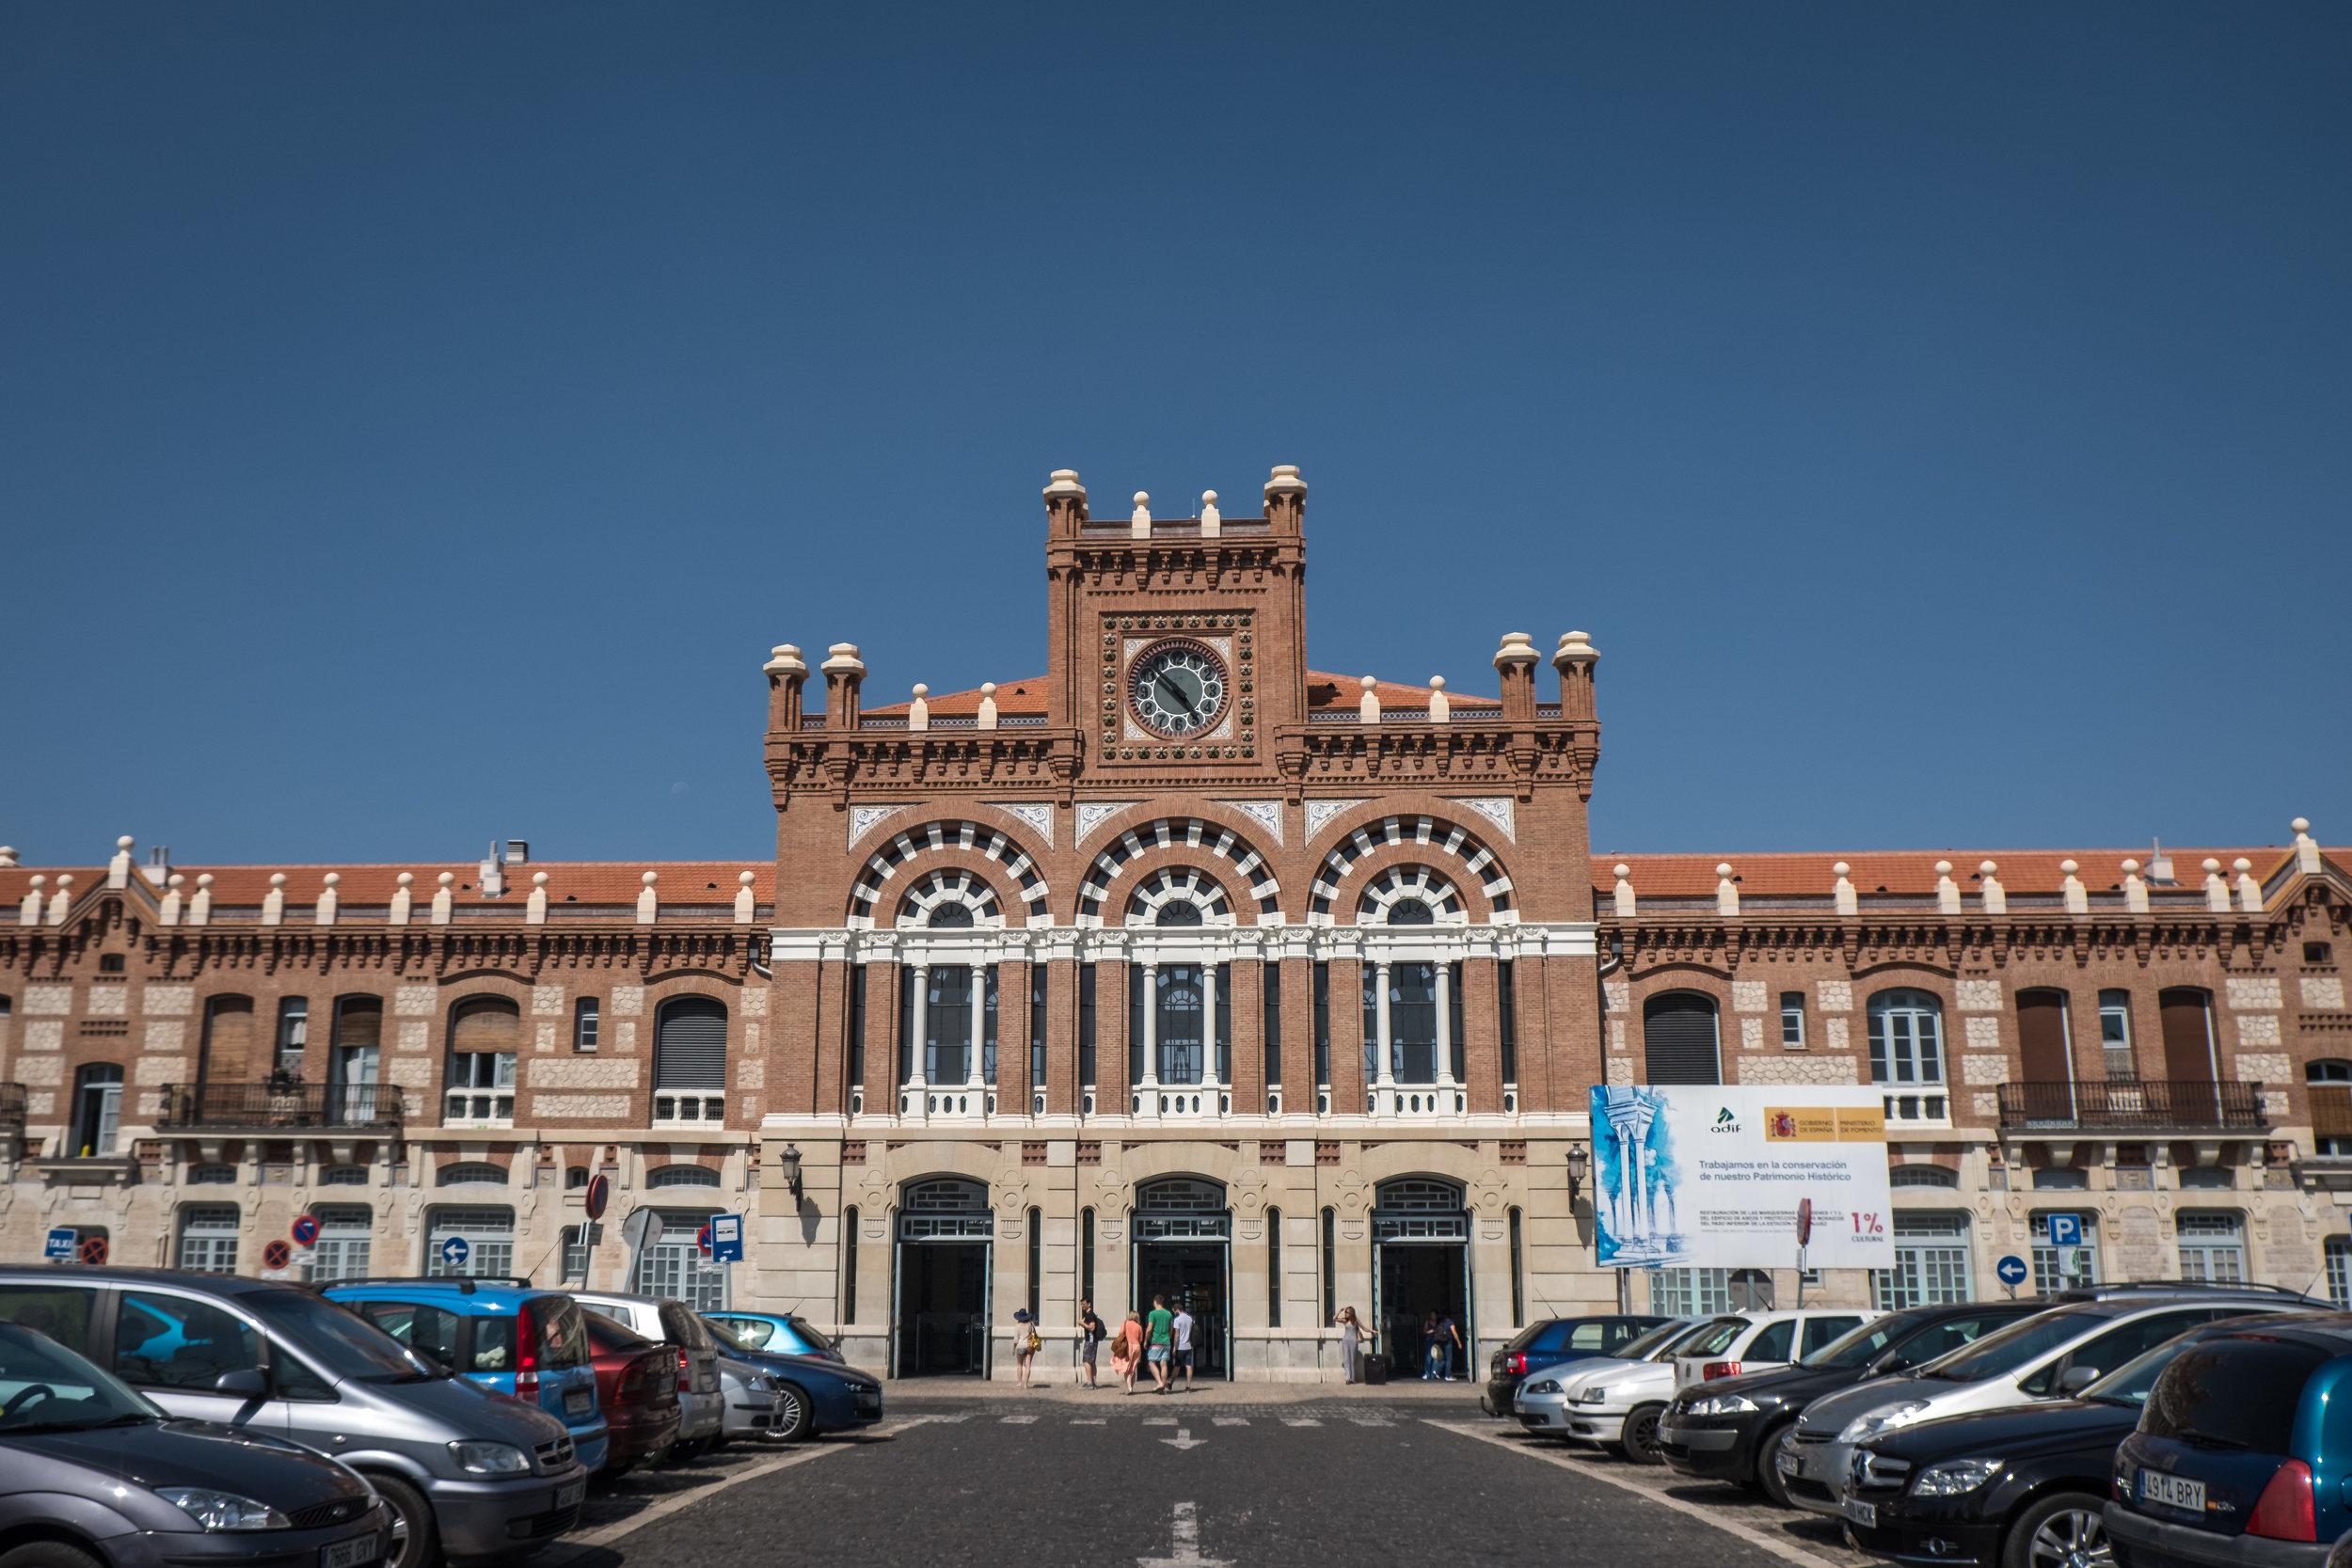 the Neo-Mudéjar-style railway station of Aranjuez